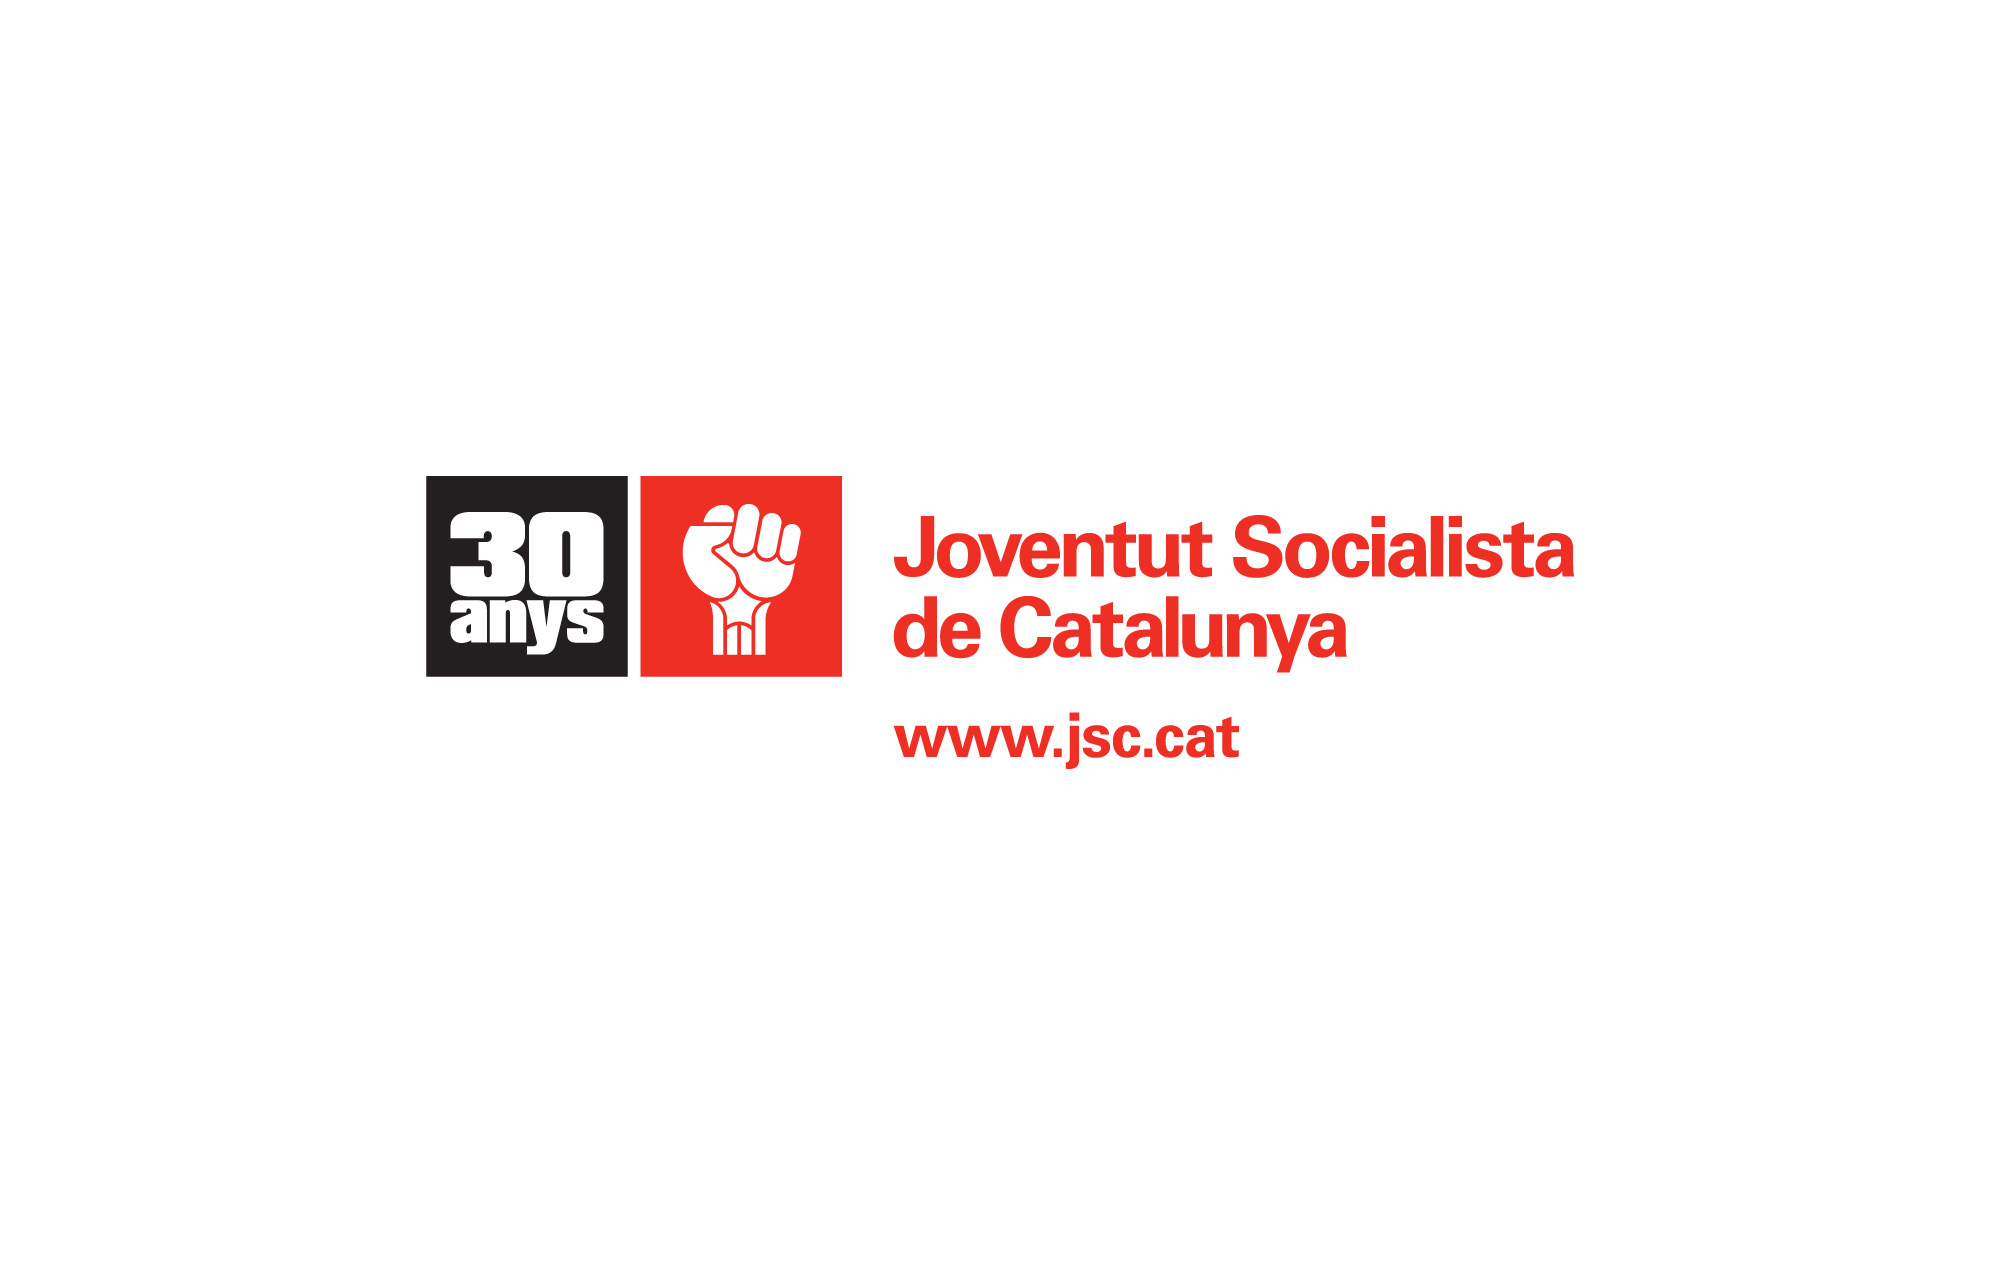 JSC-IV-30ANYS-1.jpg